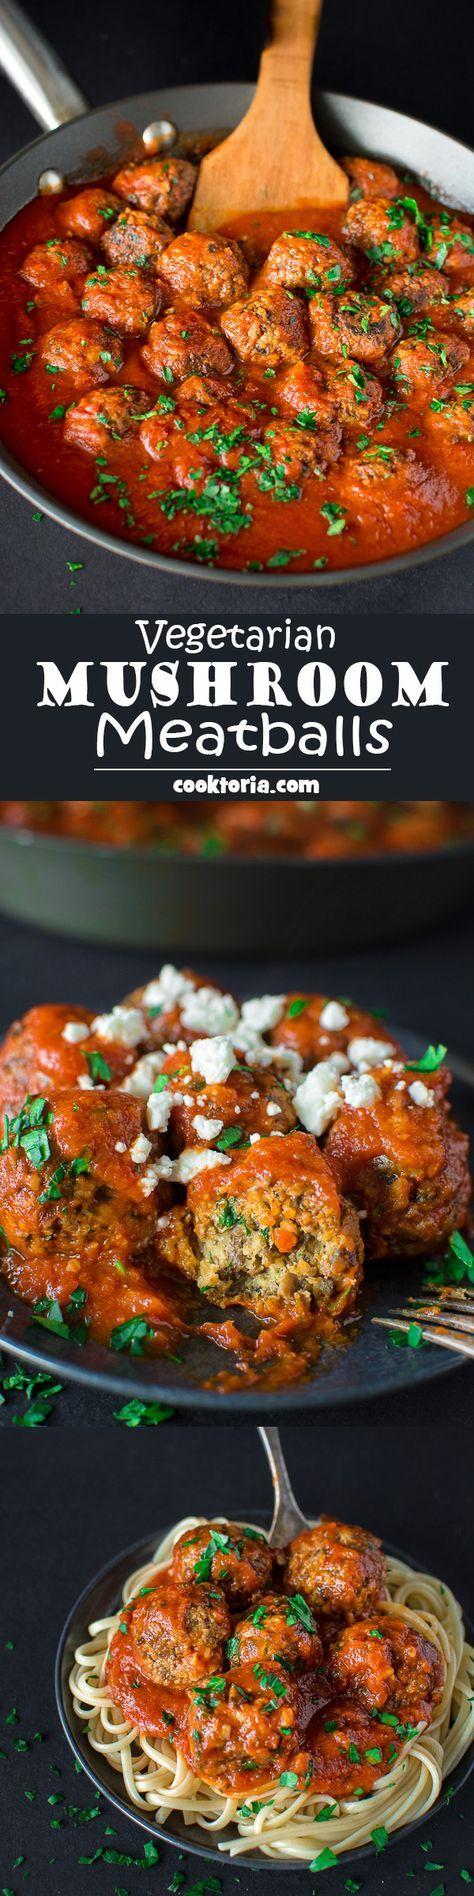 Vegetarian Mushroom Meatballs!!! YUM!!!!! Soft and moist Mushroom Meatballs are simple to prepare and make a perfect vegetarian dinner!❤ from COOKTORIA.COM . #meatballs #mushrooms